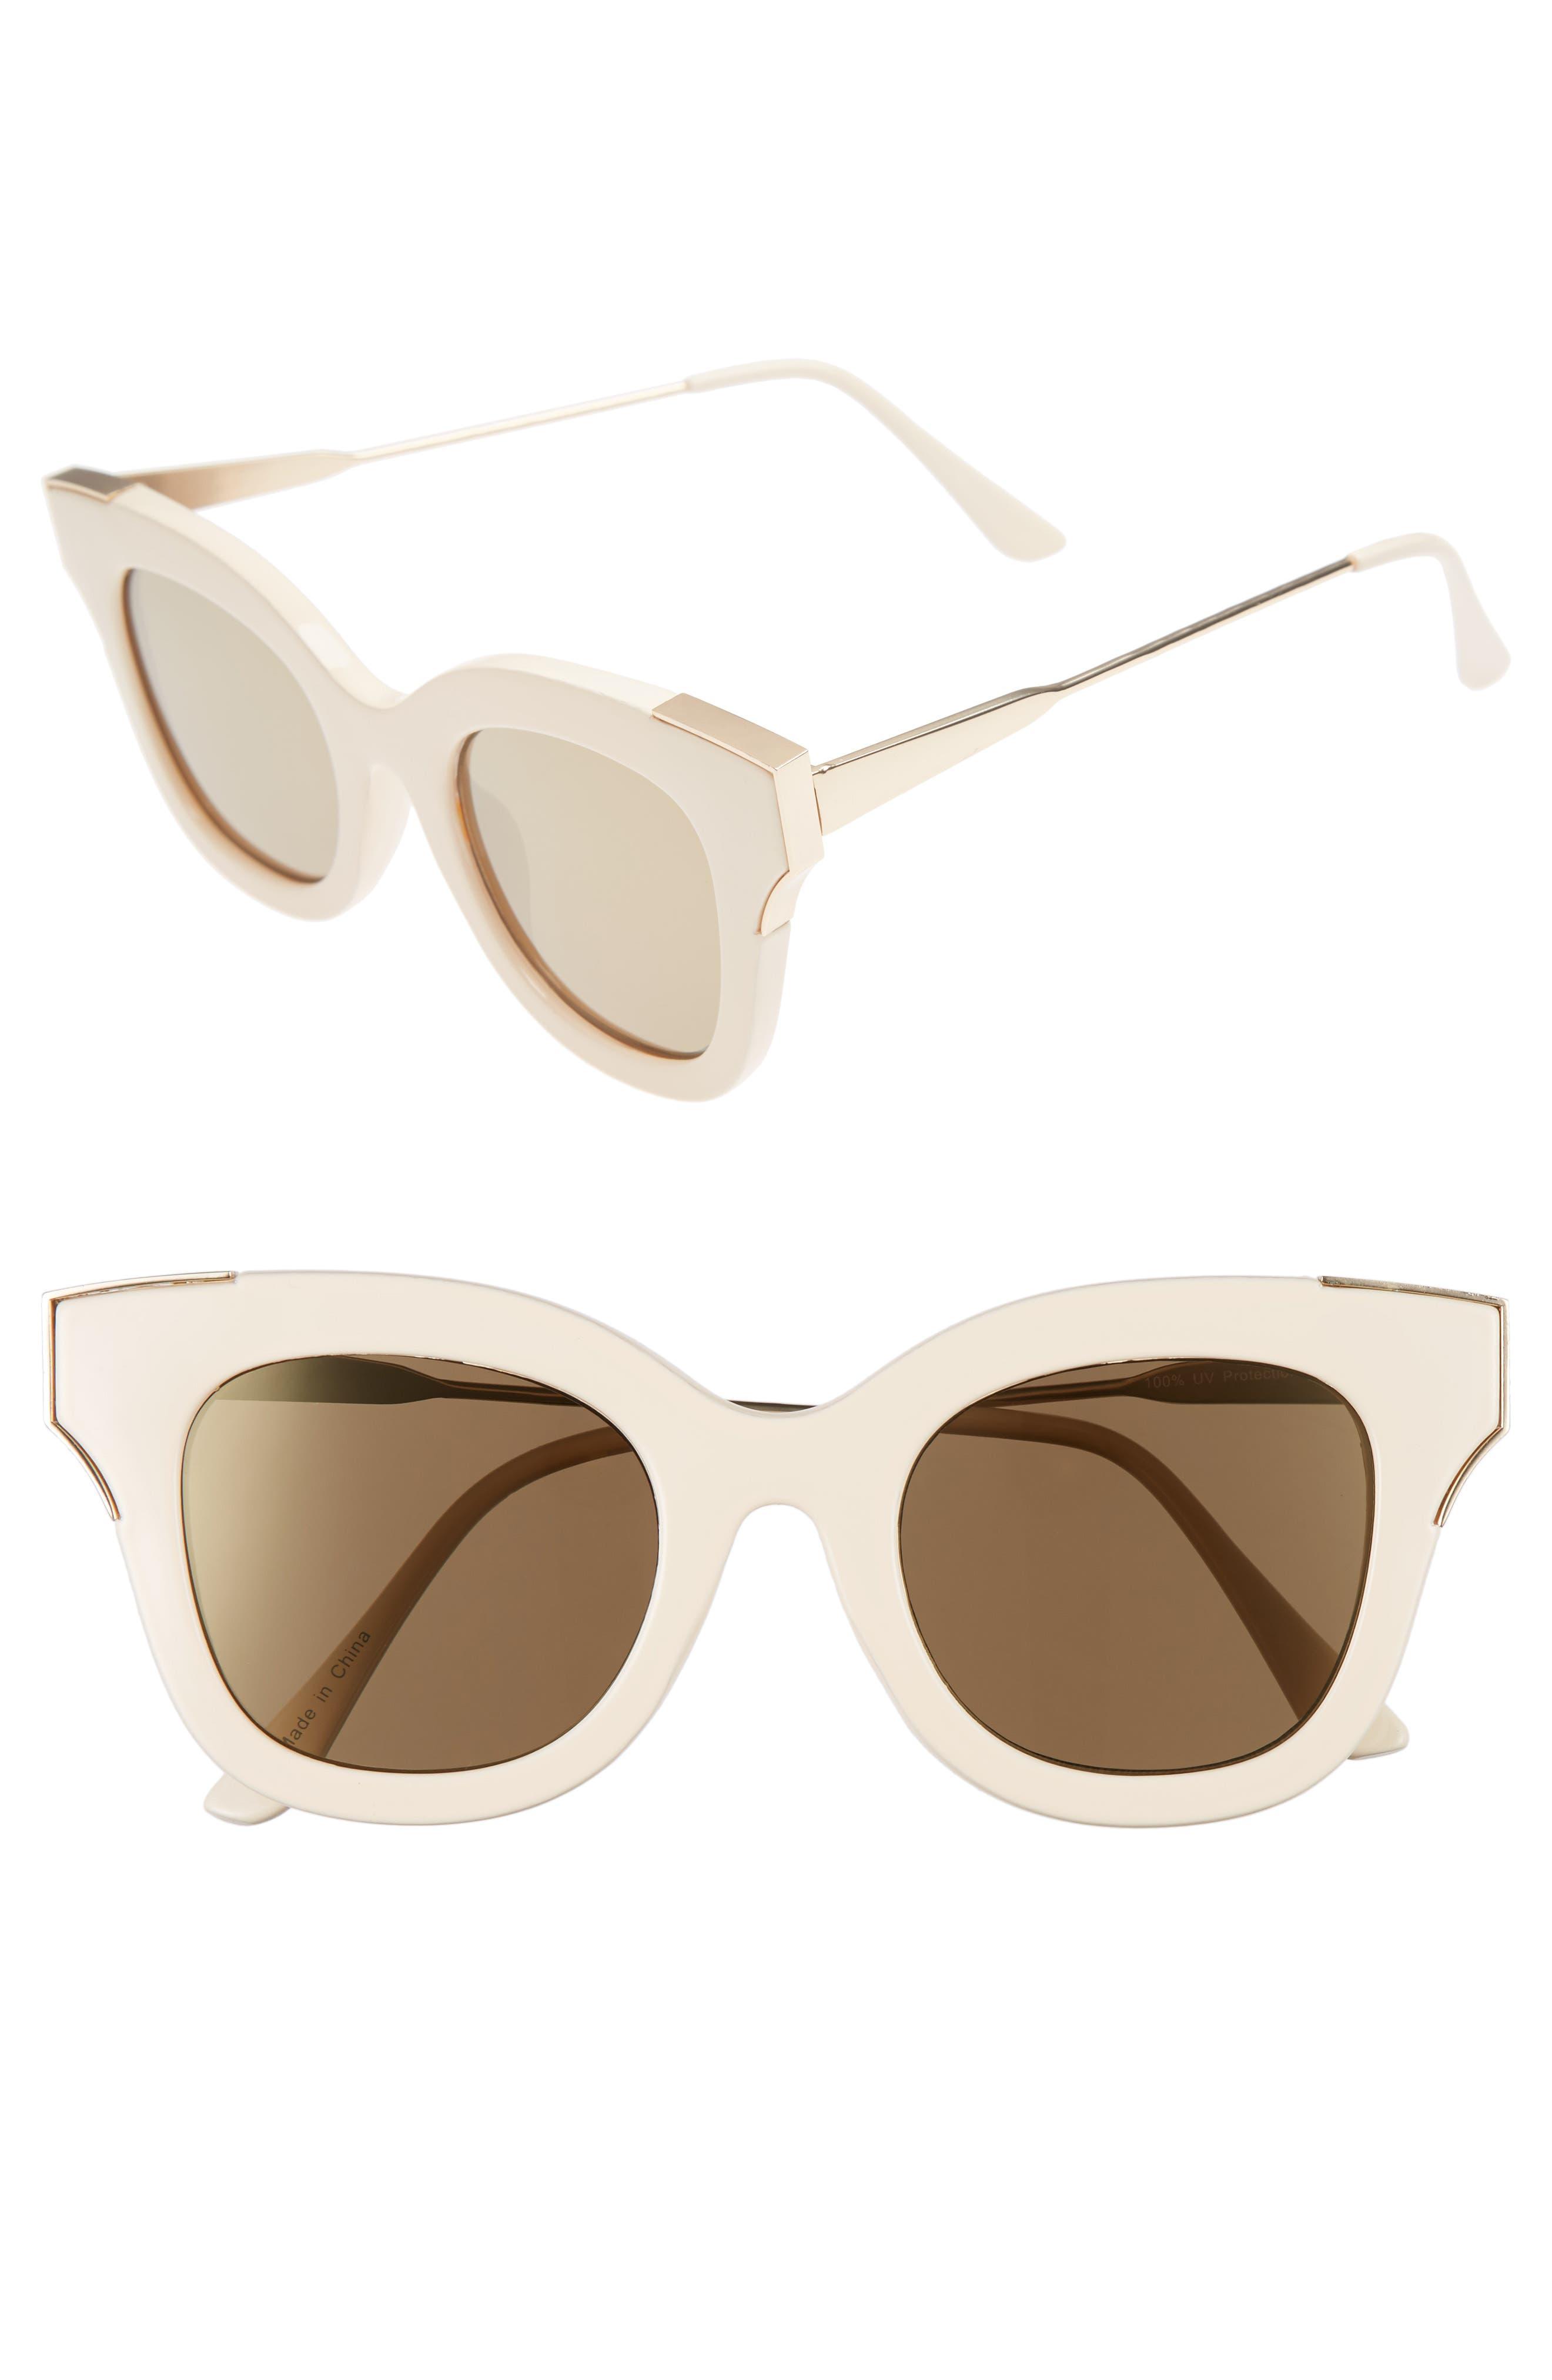 Main Image - BP. 50mm Cat Eye Sunglasses